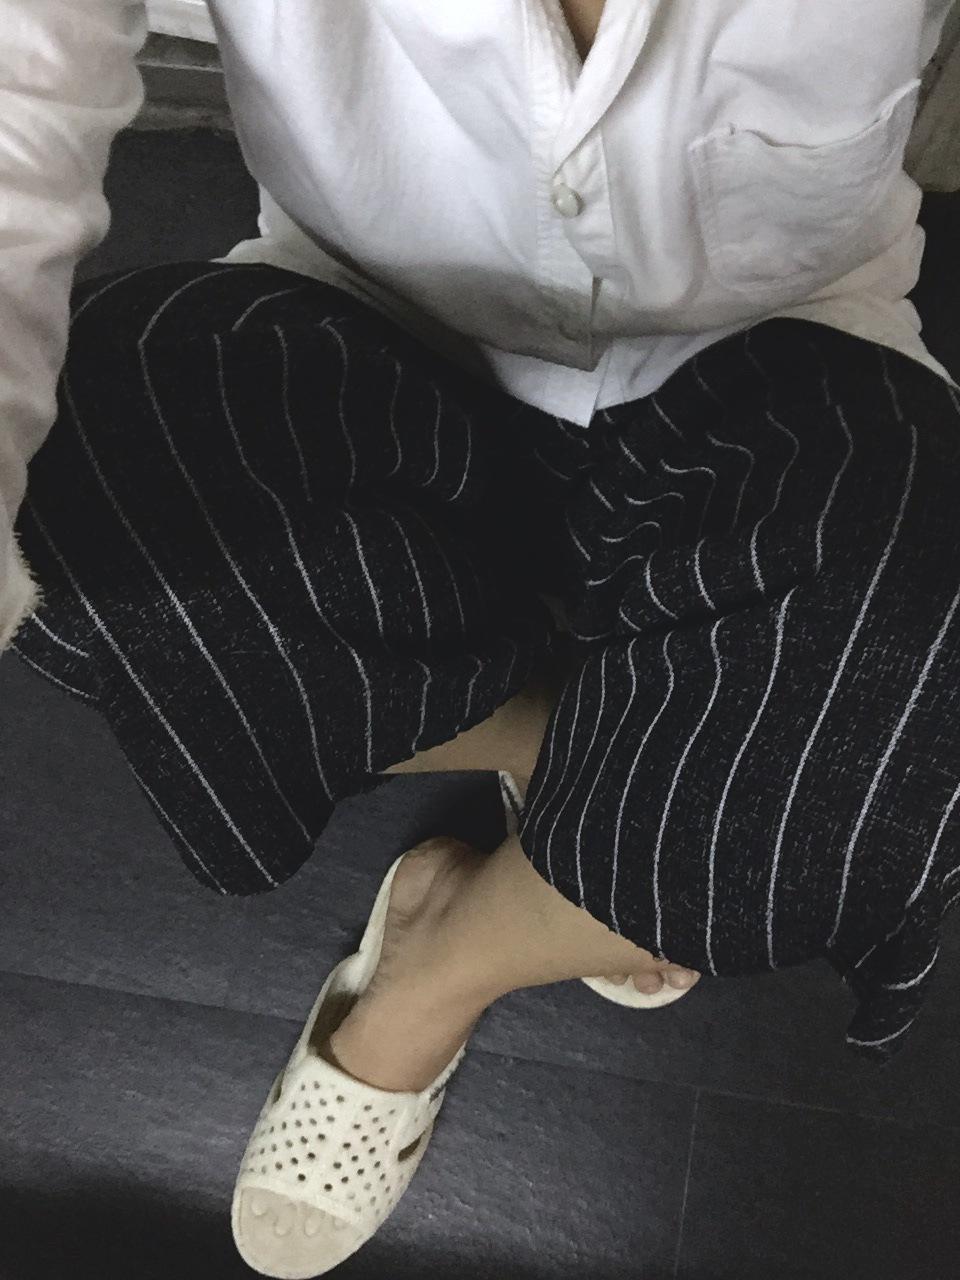 White & Black by yendangngoc